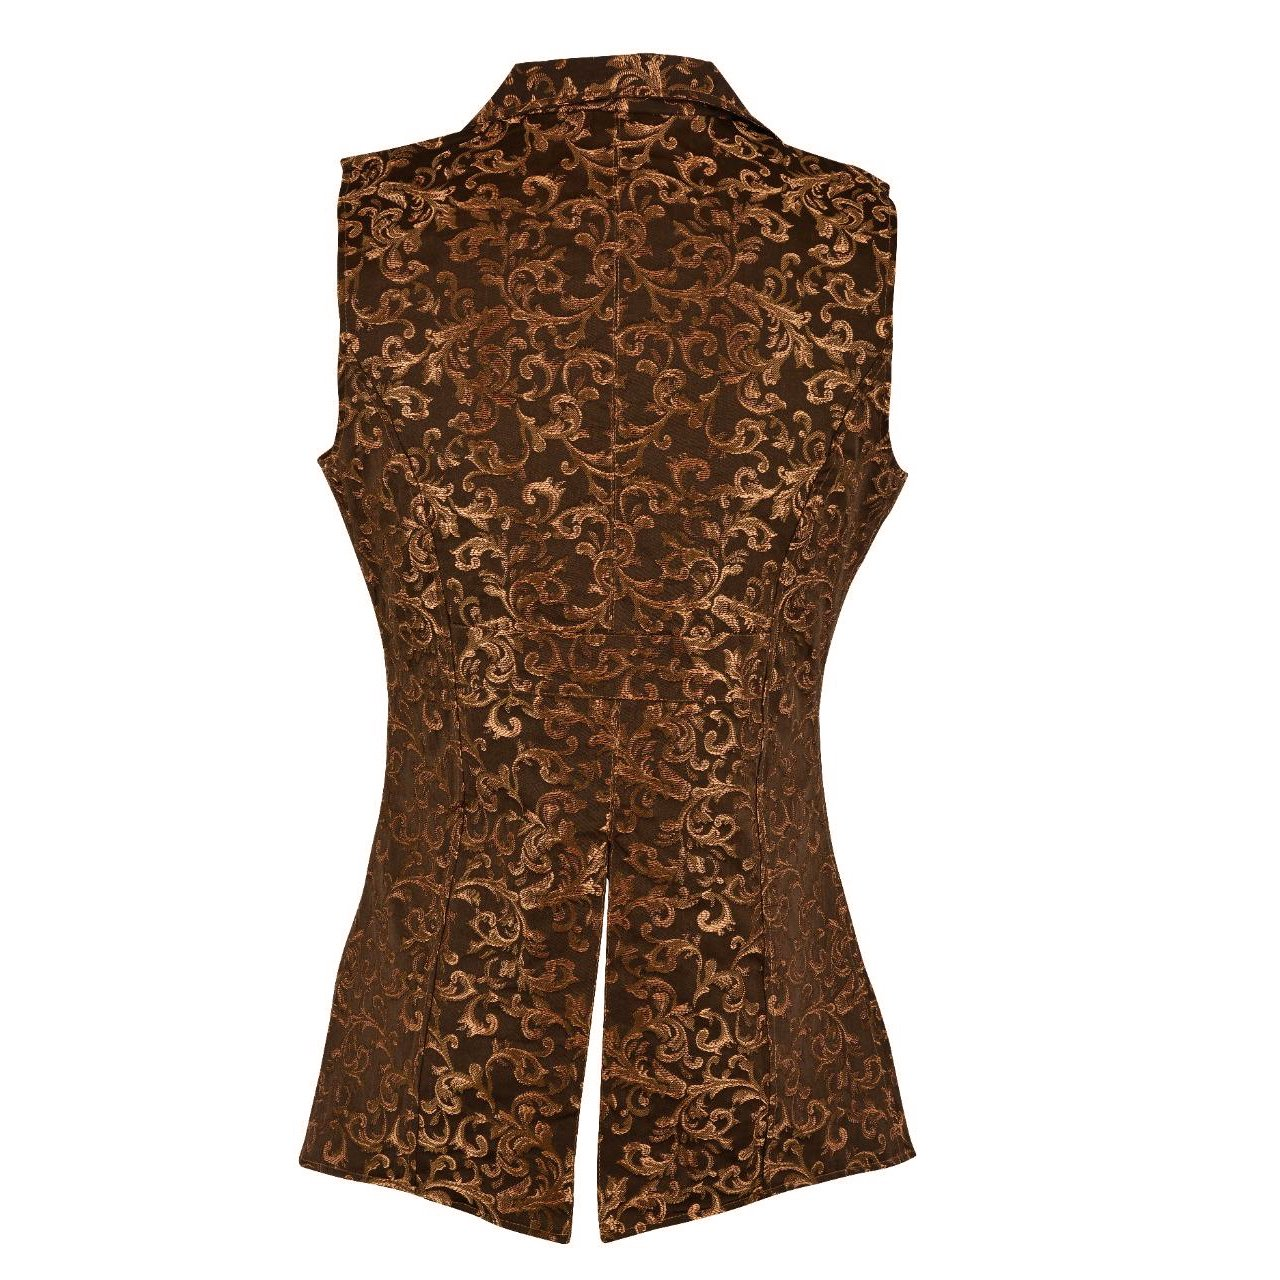 DARKROCK Gold Brocade Double Breasted GOVERNOR Vest Waistcoat(back)